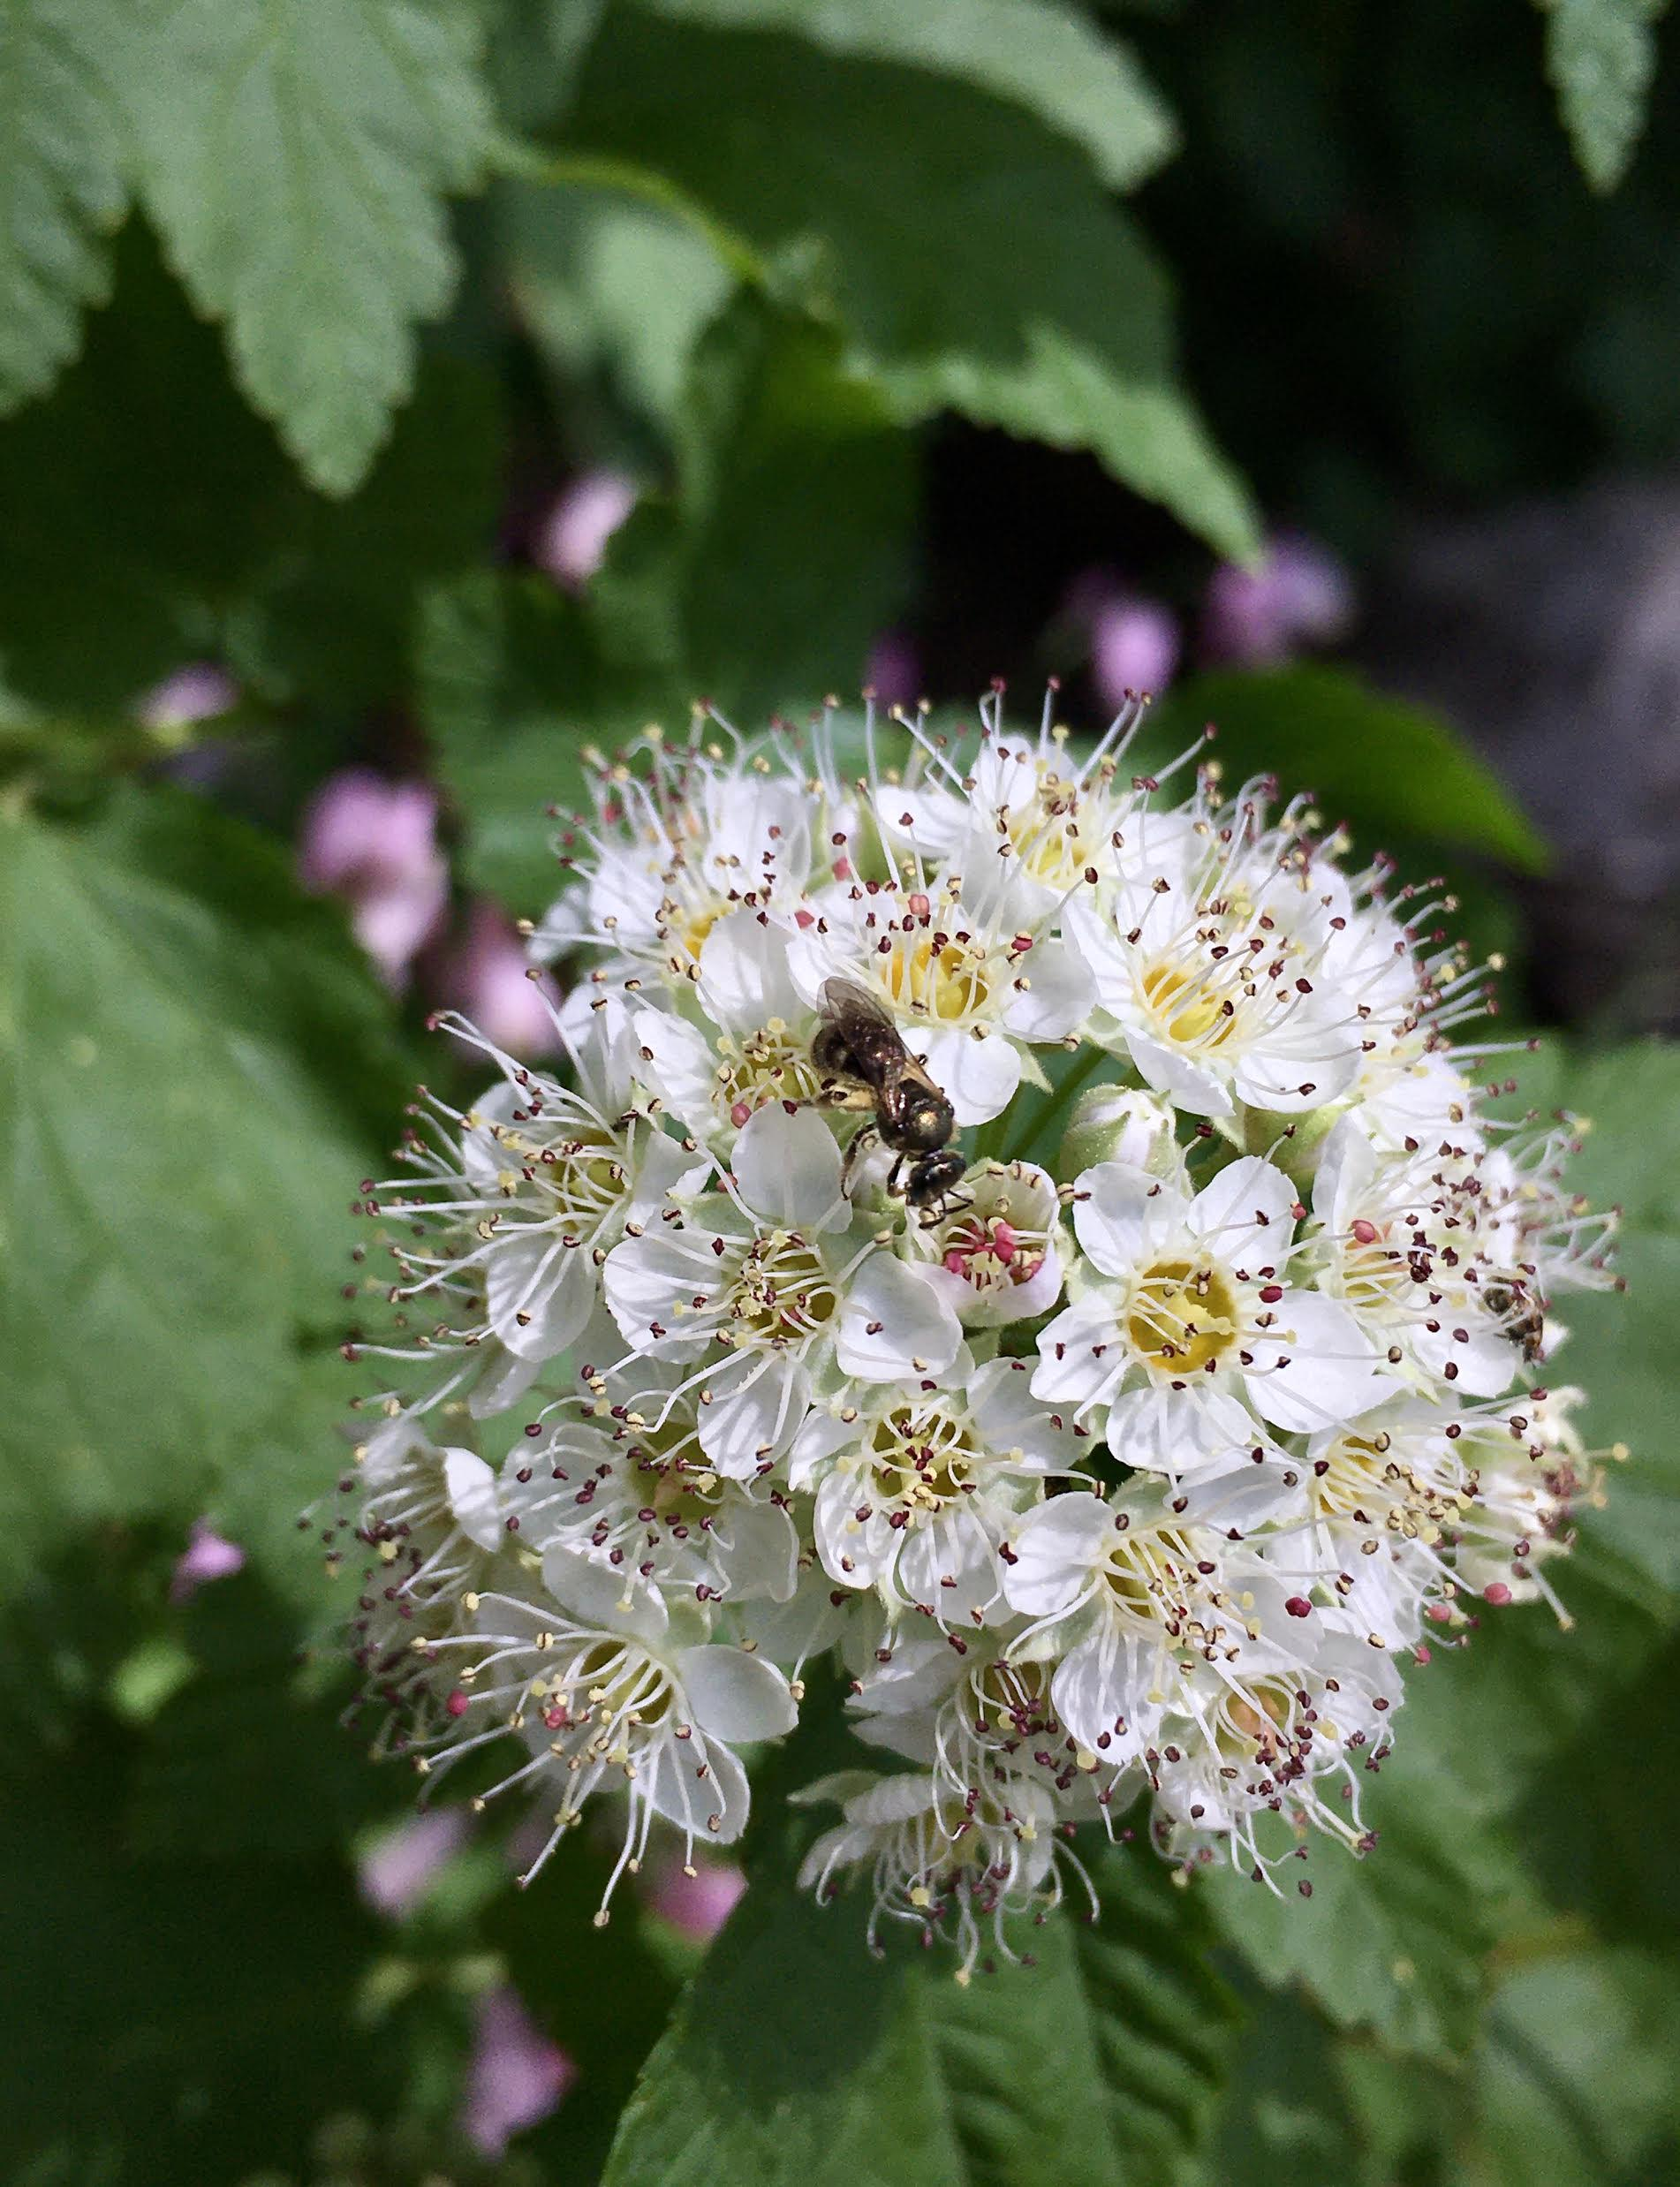 metallic sweat bee